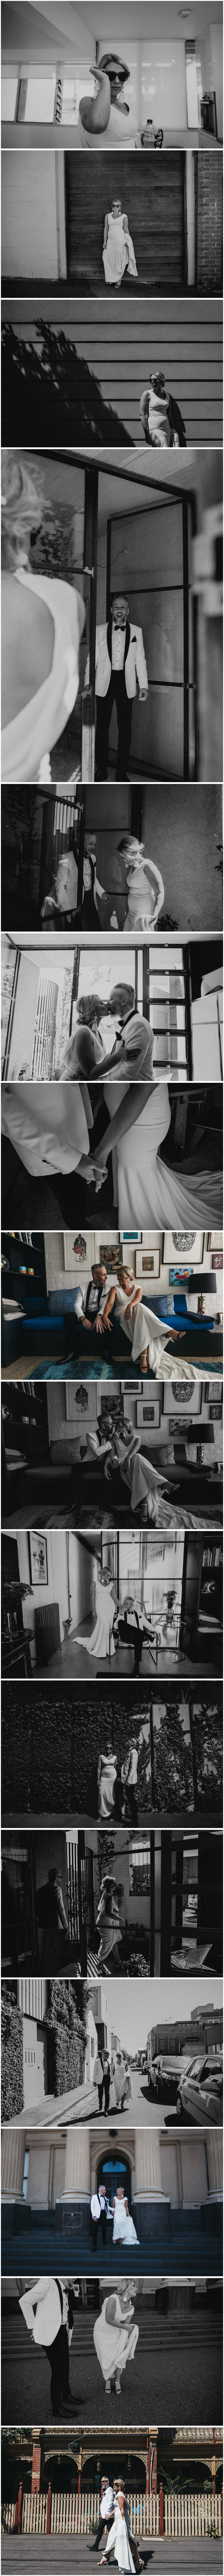 Bride wearing THIEA wedding dress at super cool Melbourne City & Beach Wedding - venue: Smart Artz Gallery